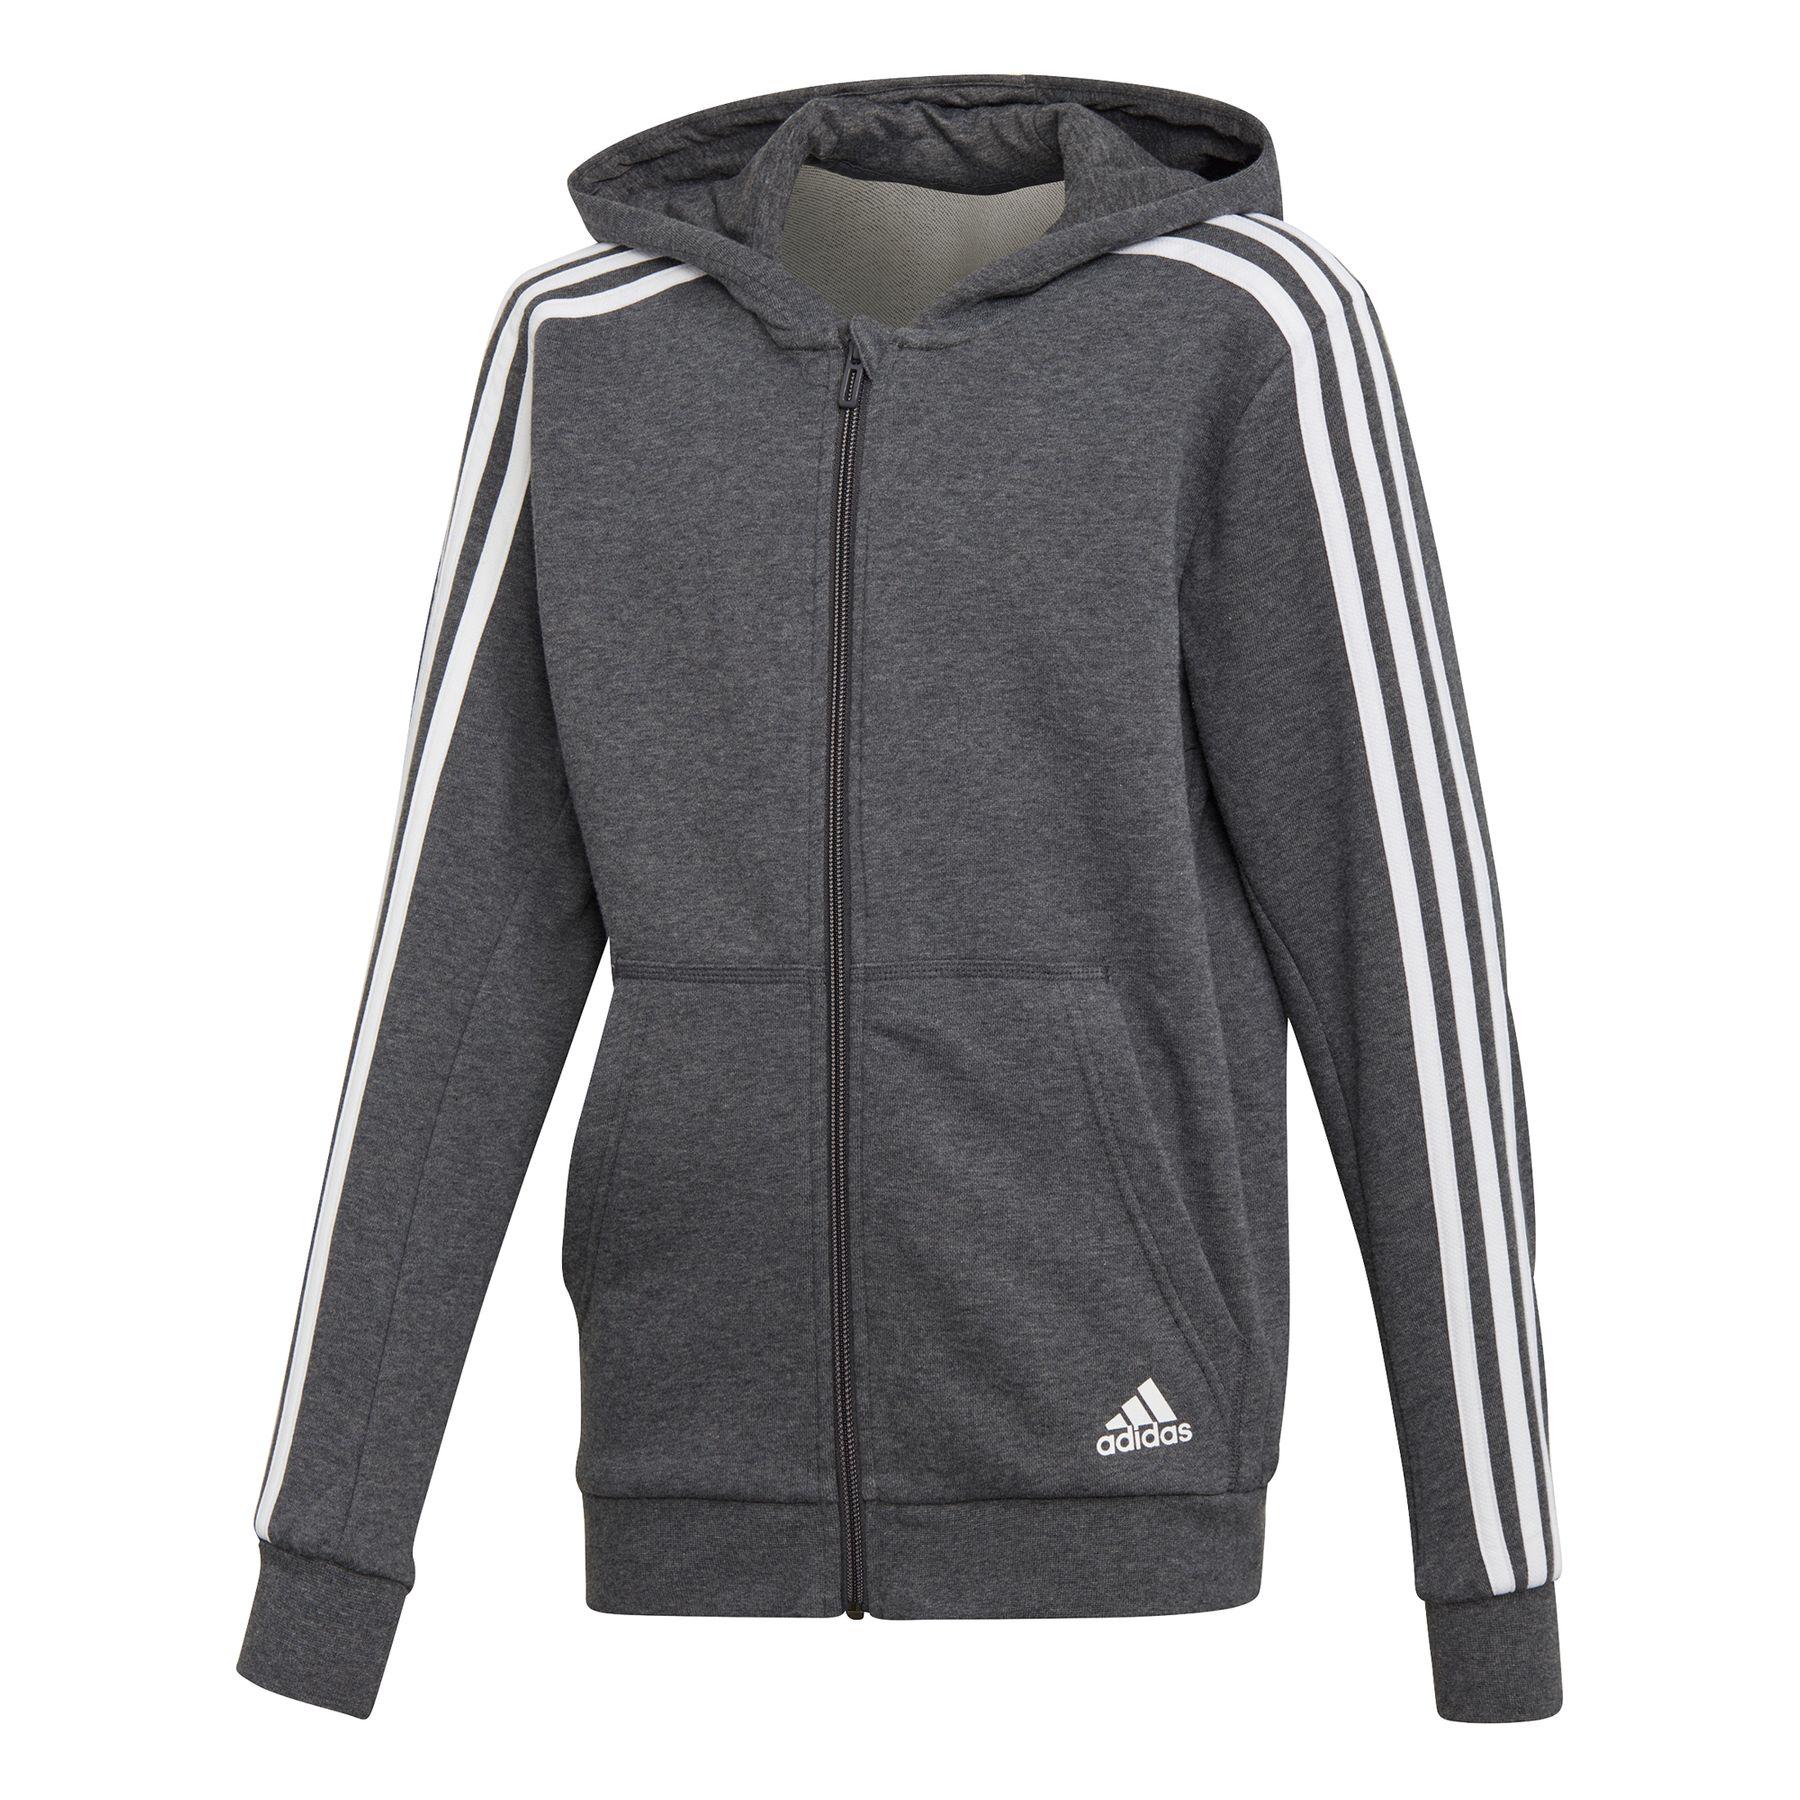 Details zu Adidas Essentials 3-Streifen Kapuzenjacke Kinder grau  Trainingsjacke ESS NEU